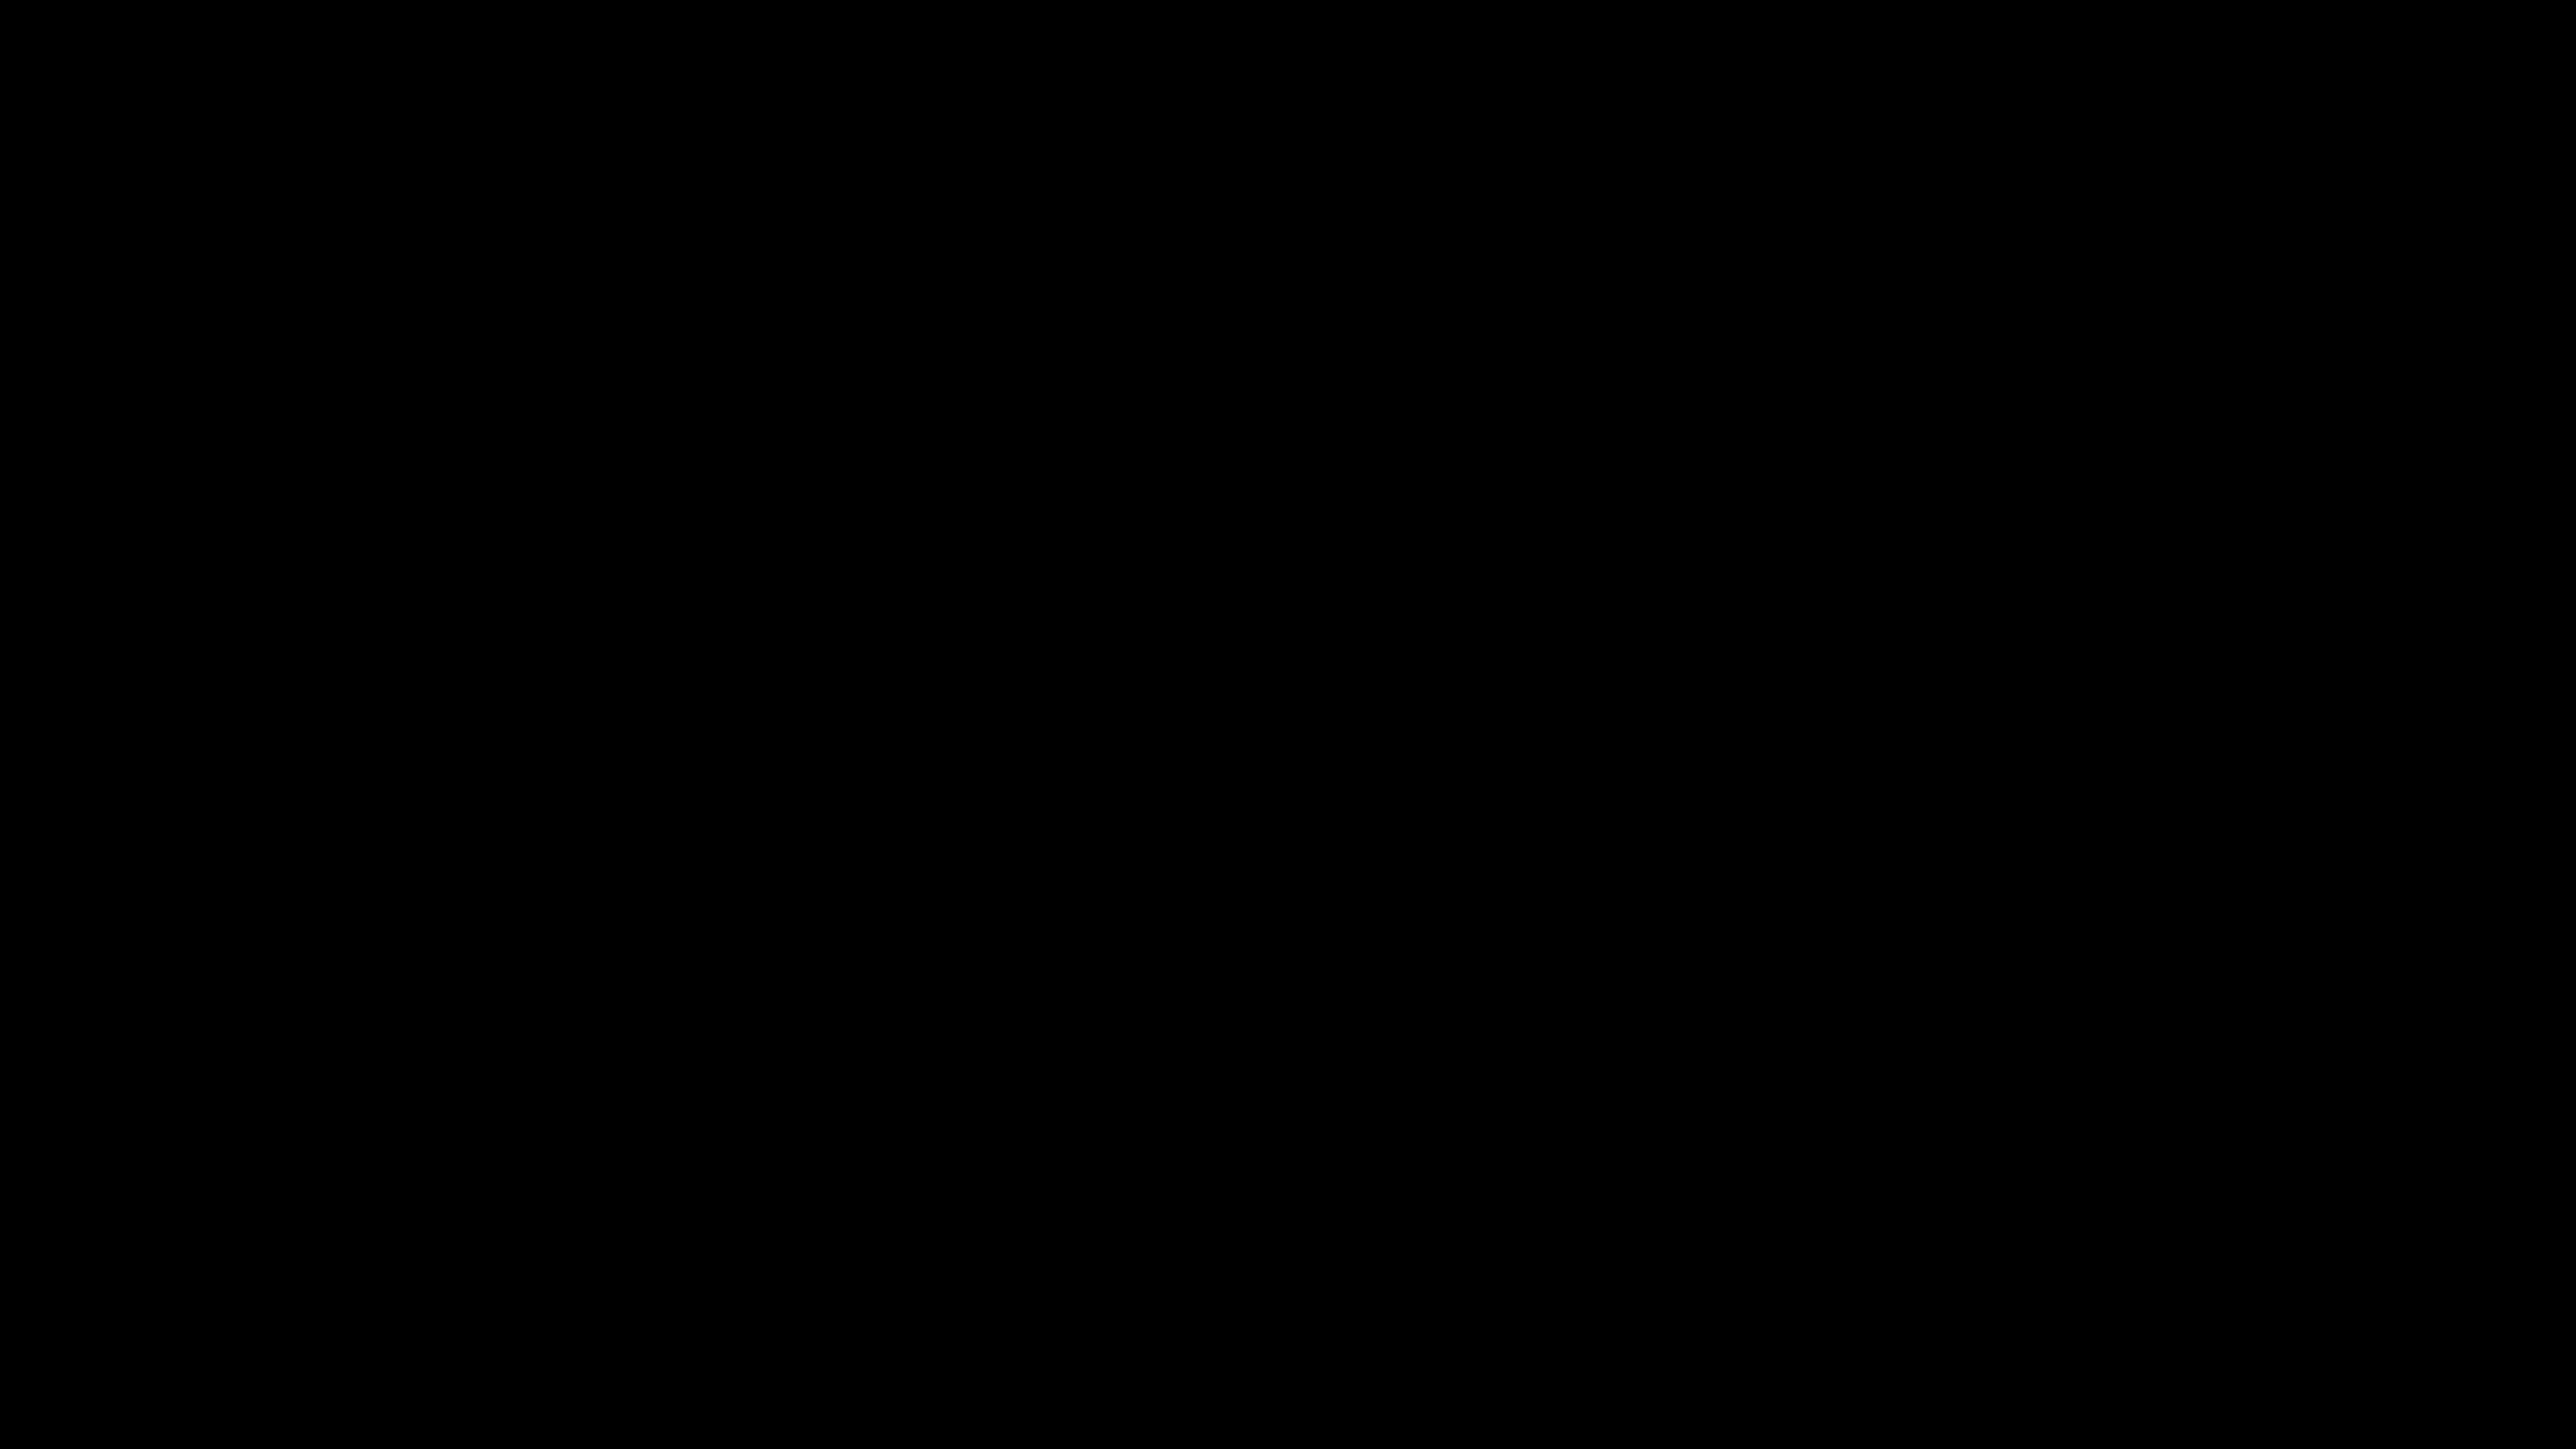 20180412_121647